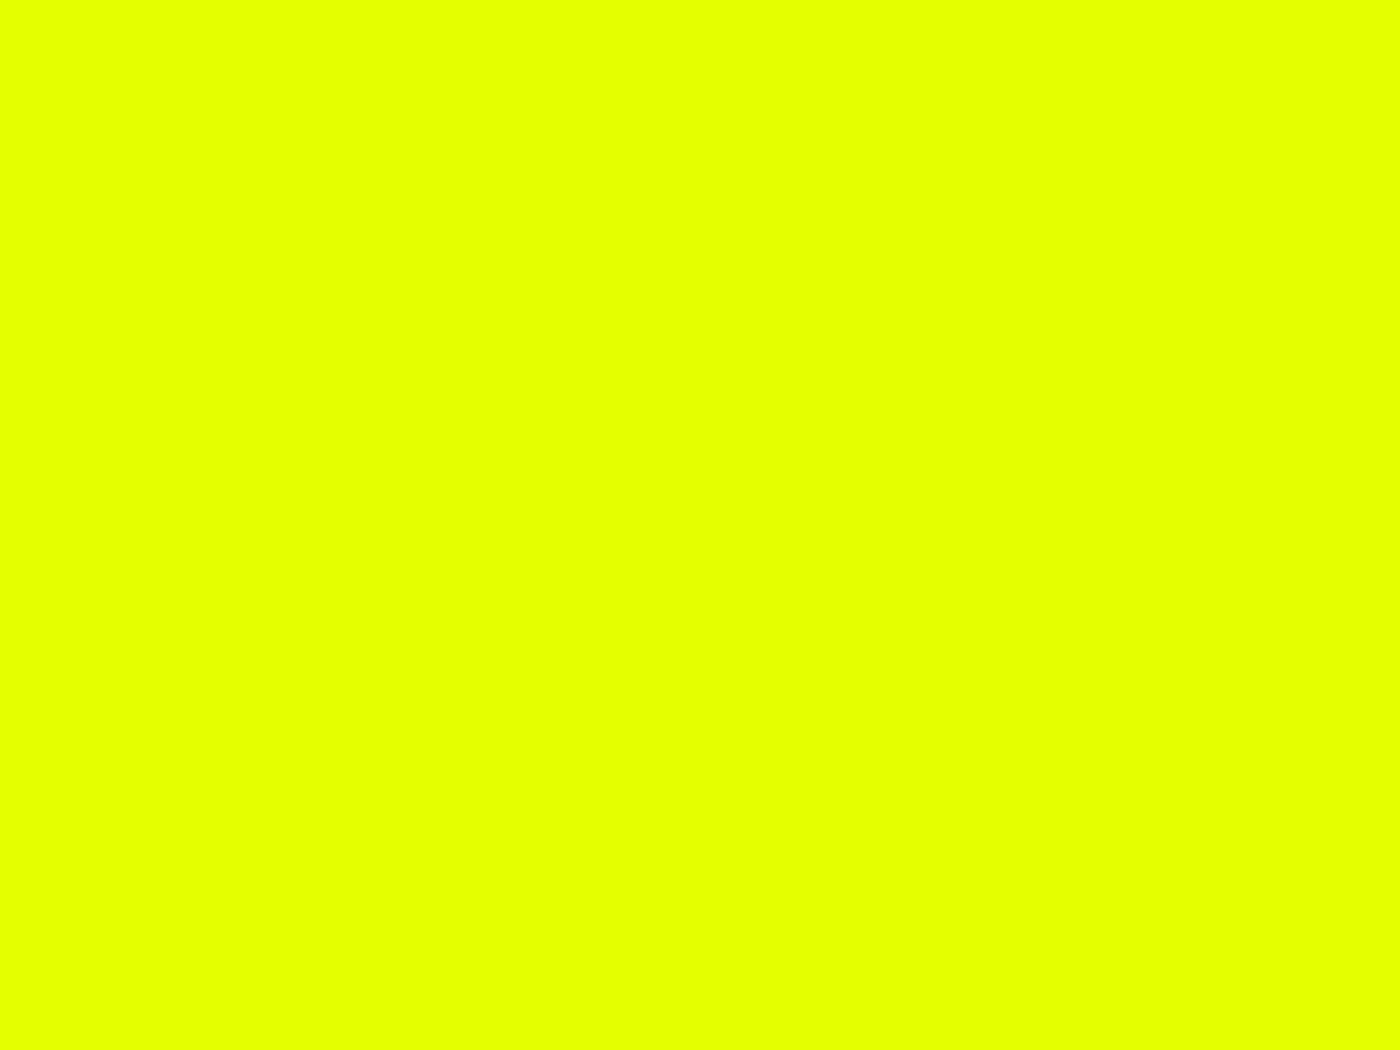 1400x1050 Lemon Lime Solid Color Background